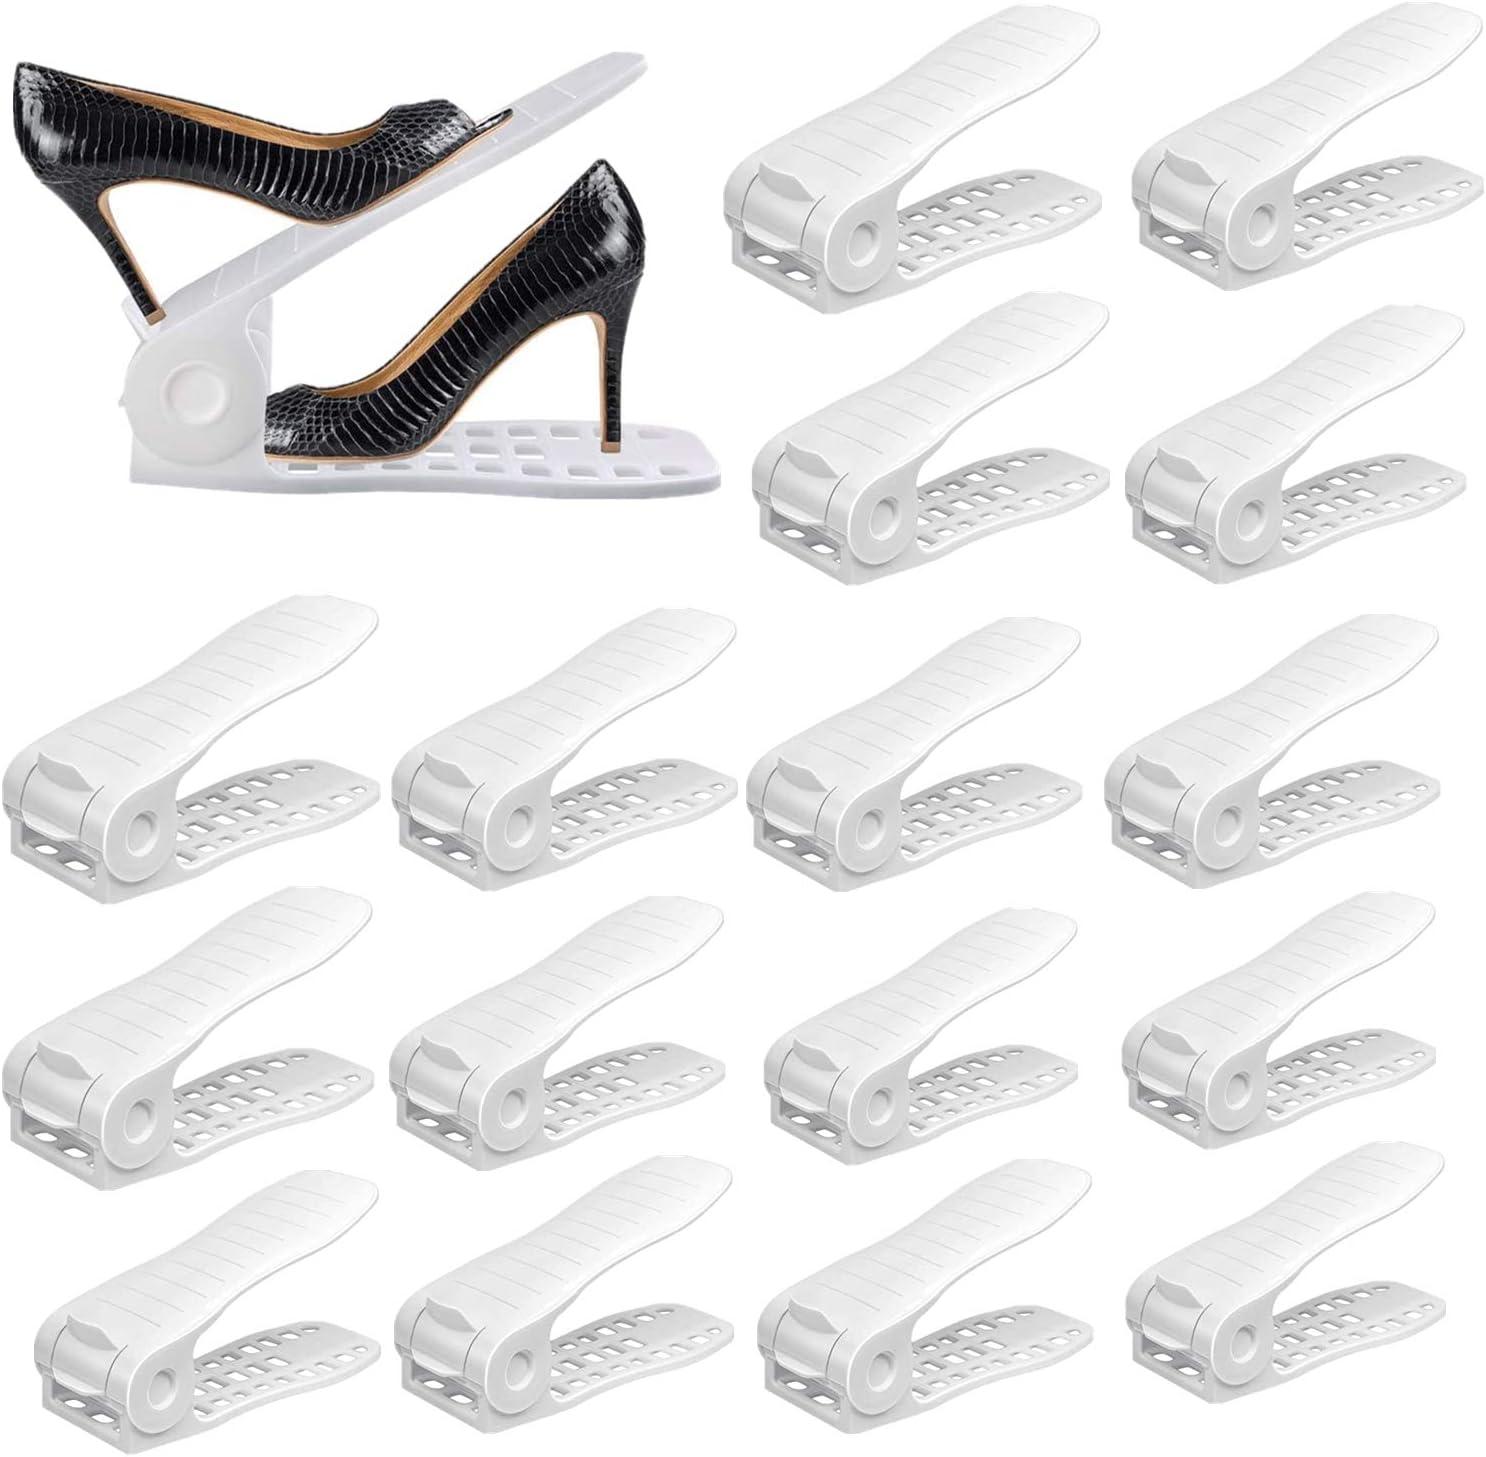 YIHATA Shoe Slots Organizer, Thickening Hollow Shoe Rack Adjustable Shoe Stacker Space Saver,Double Deck Shoe Rack Holder for Closet Organization (16pack awhite)